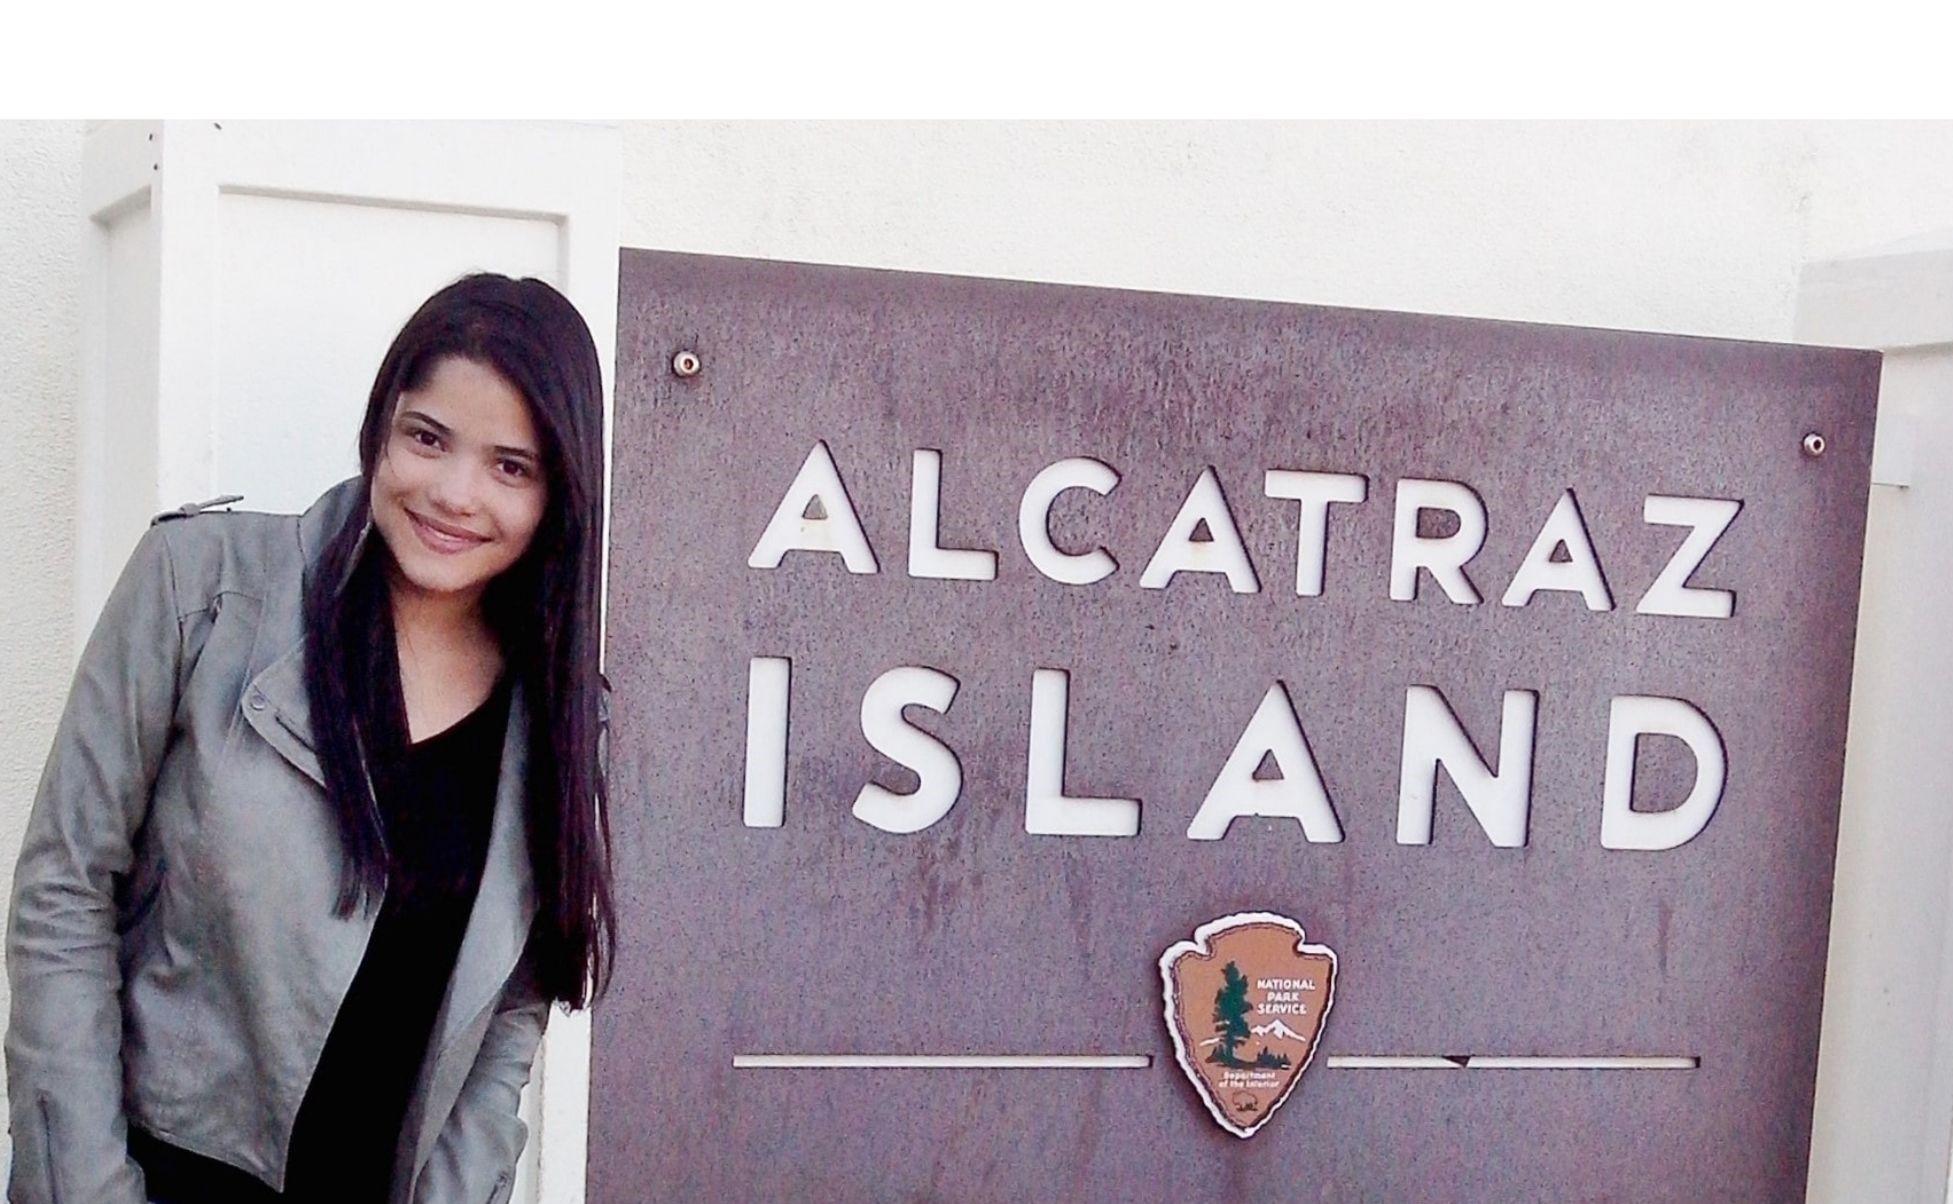 placa marrom escrito alcatraz island